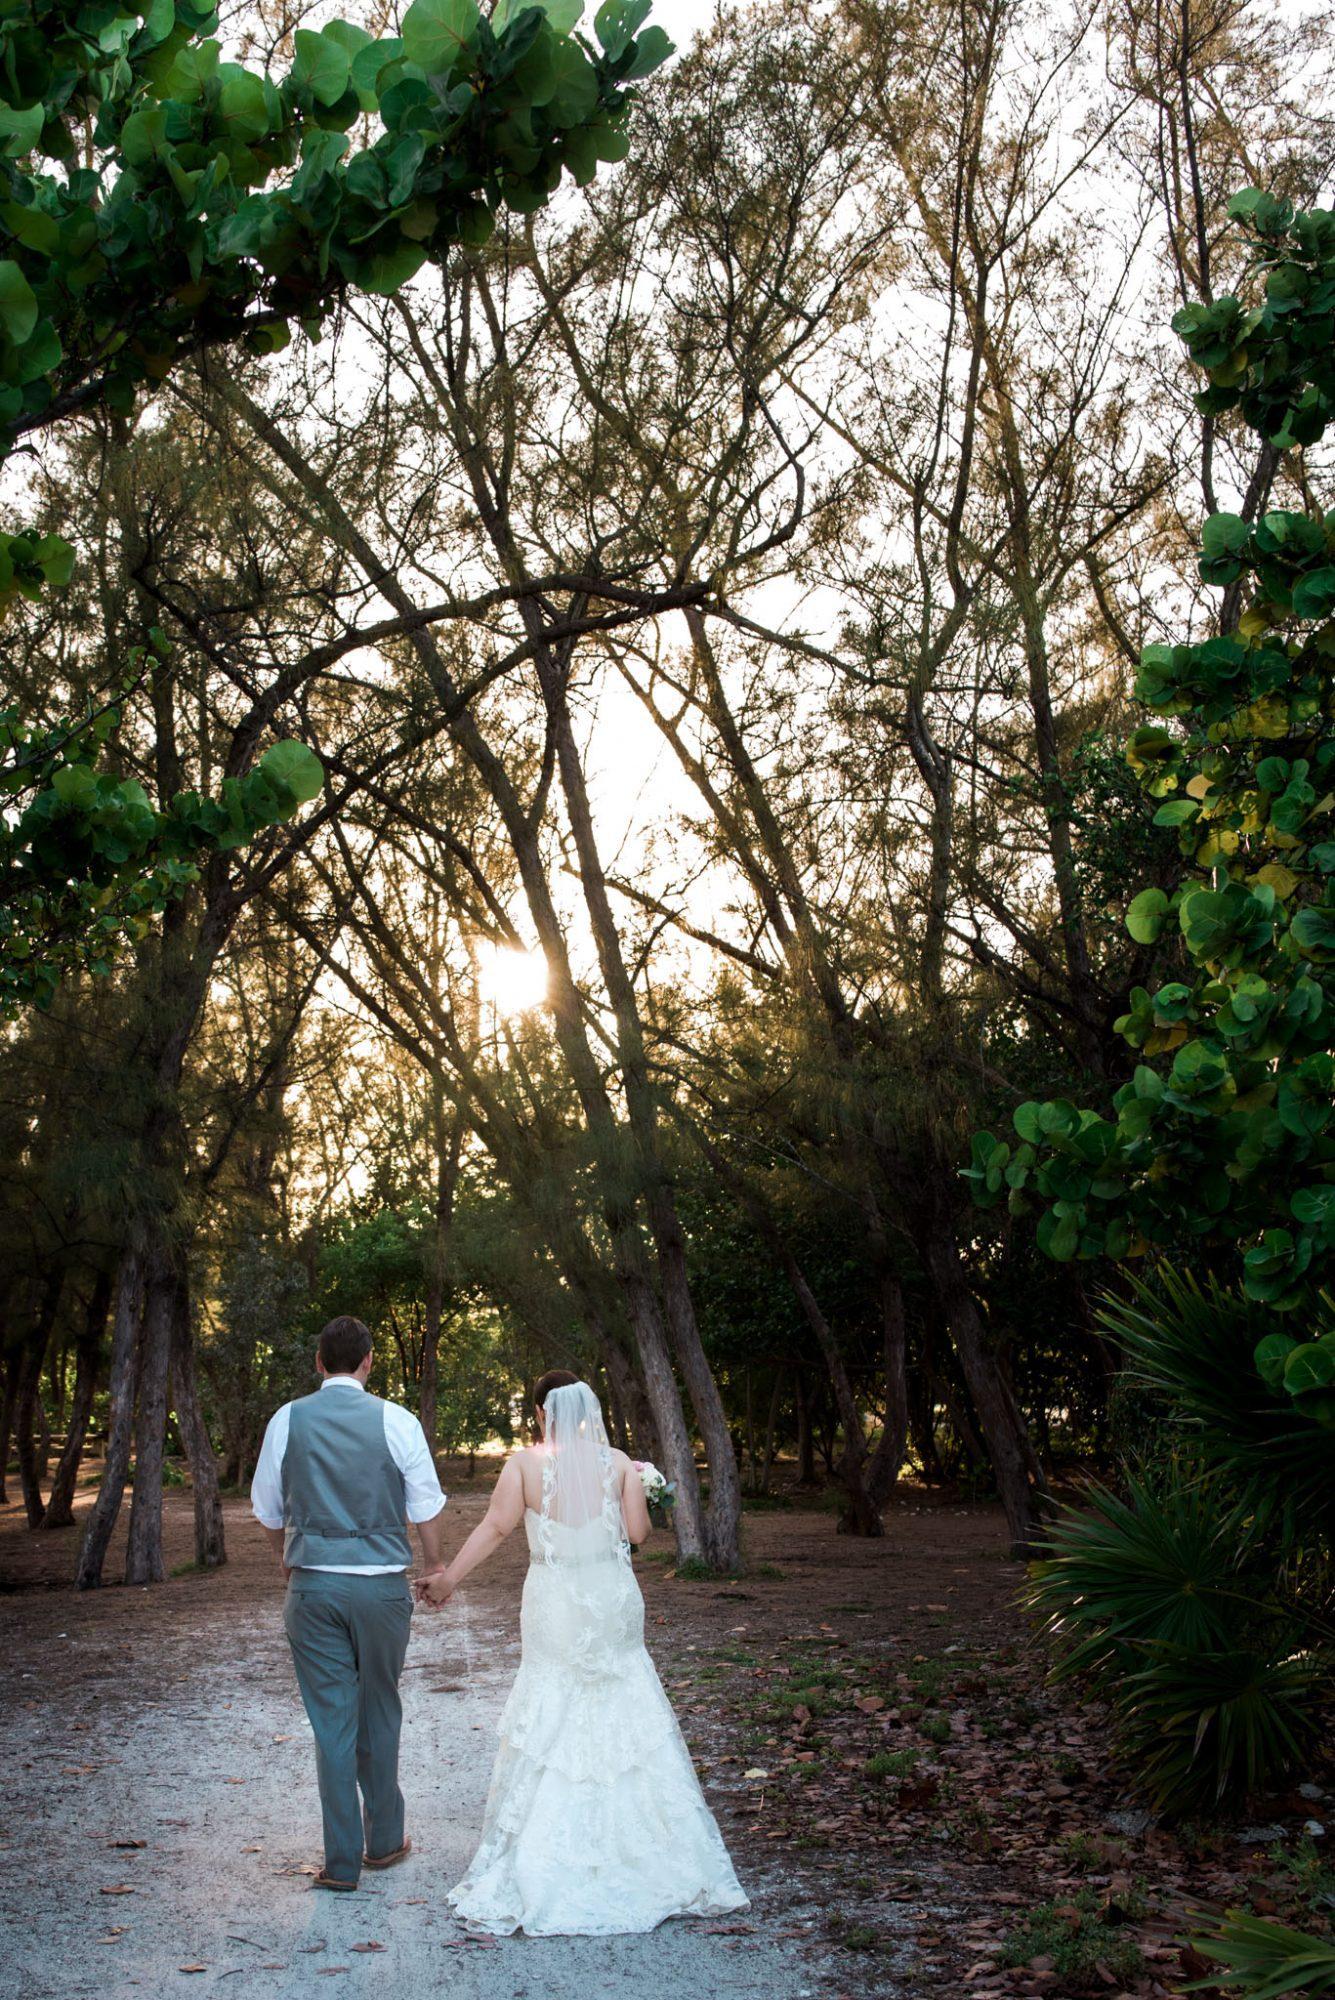 Heather Jeff Key West Wedding Photographer Fort Zachary Taylor 24 - Heather & Jeff - Key West Wedding Photographer - Fort Zachary Taylor